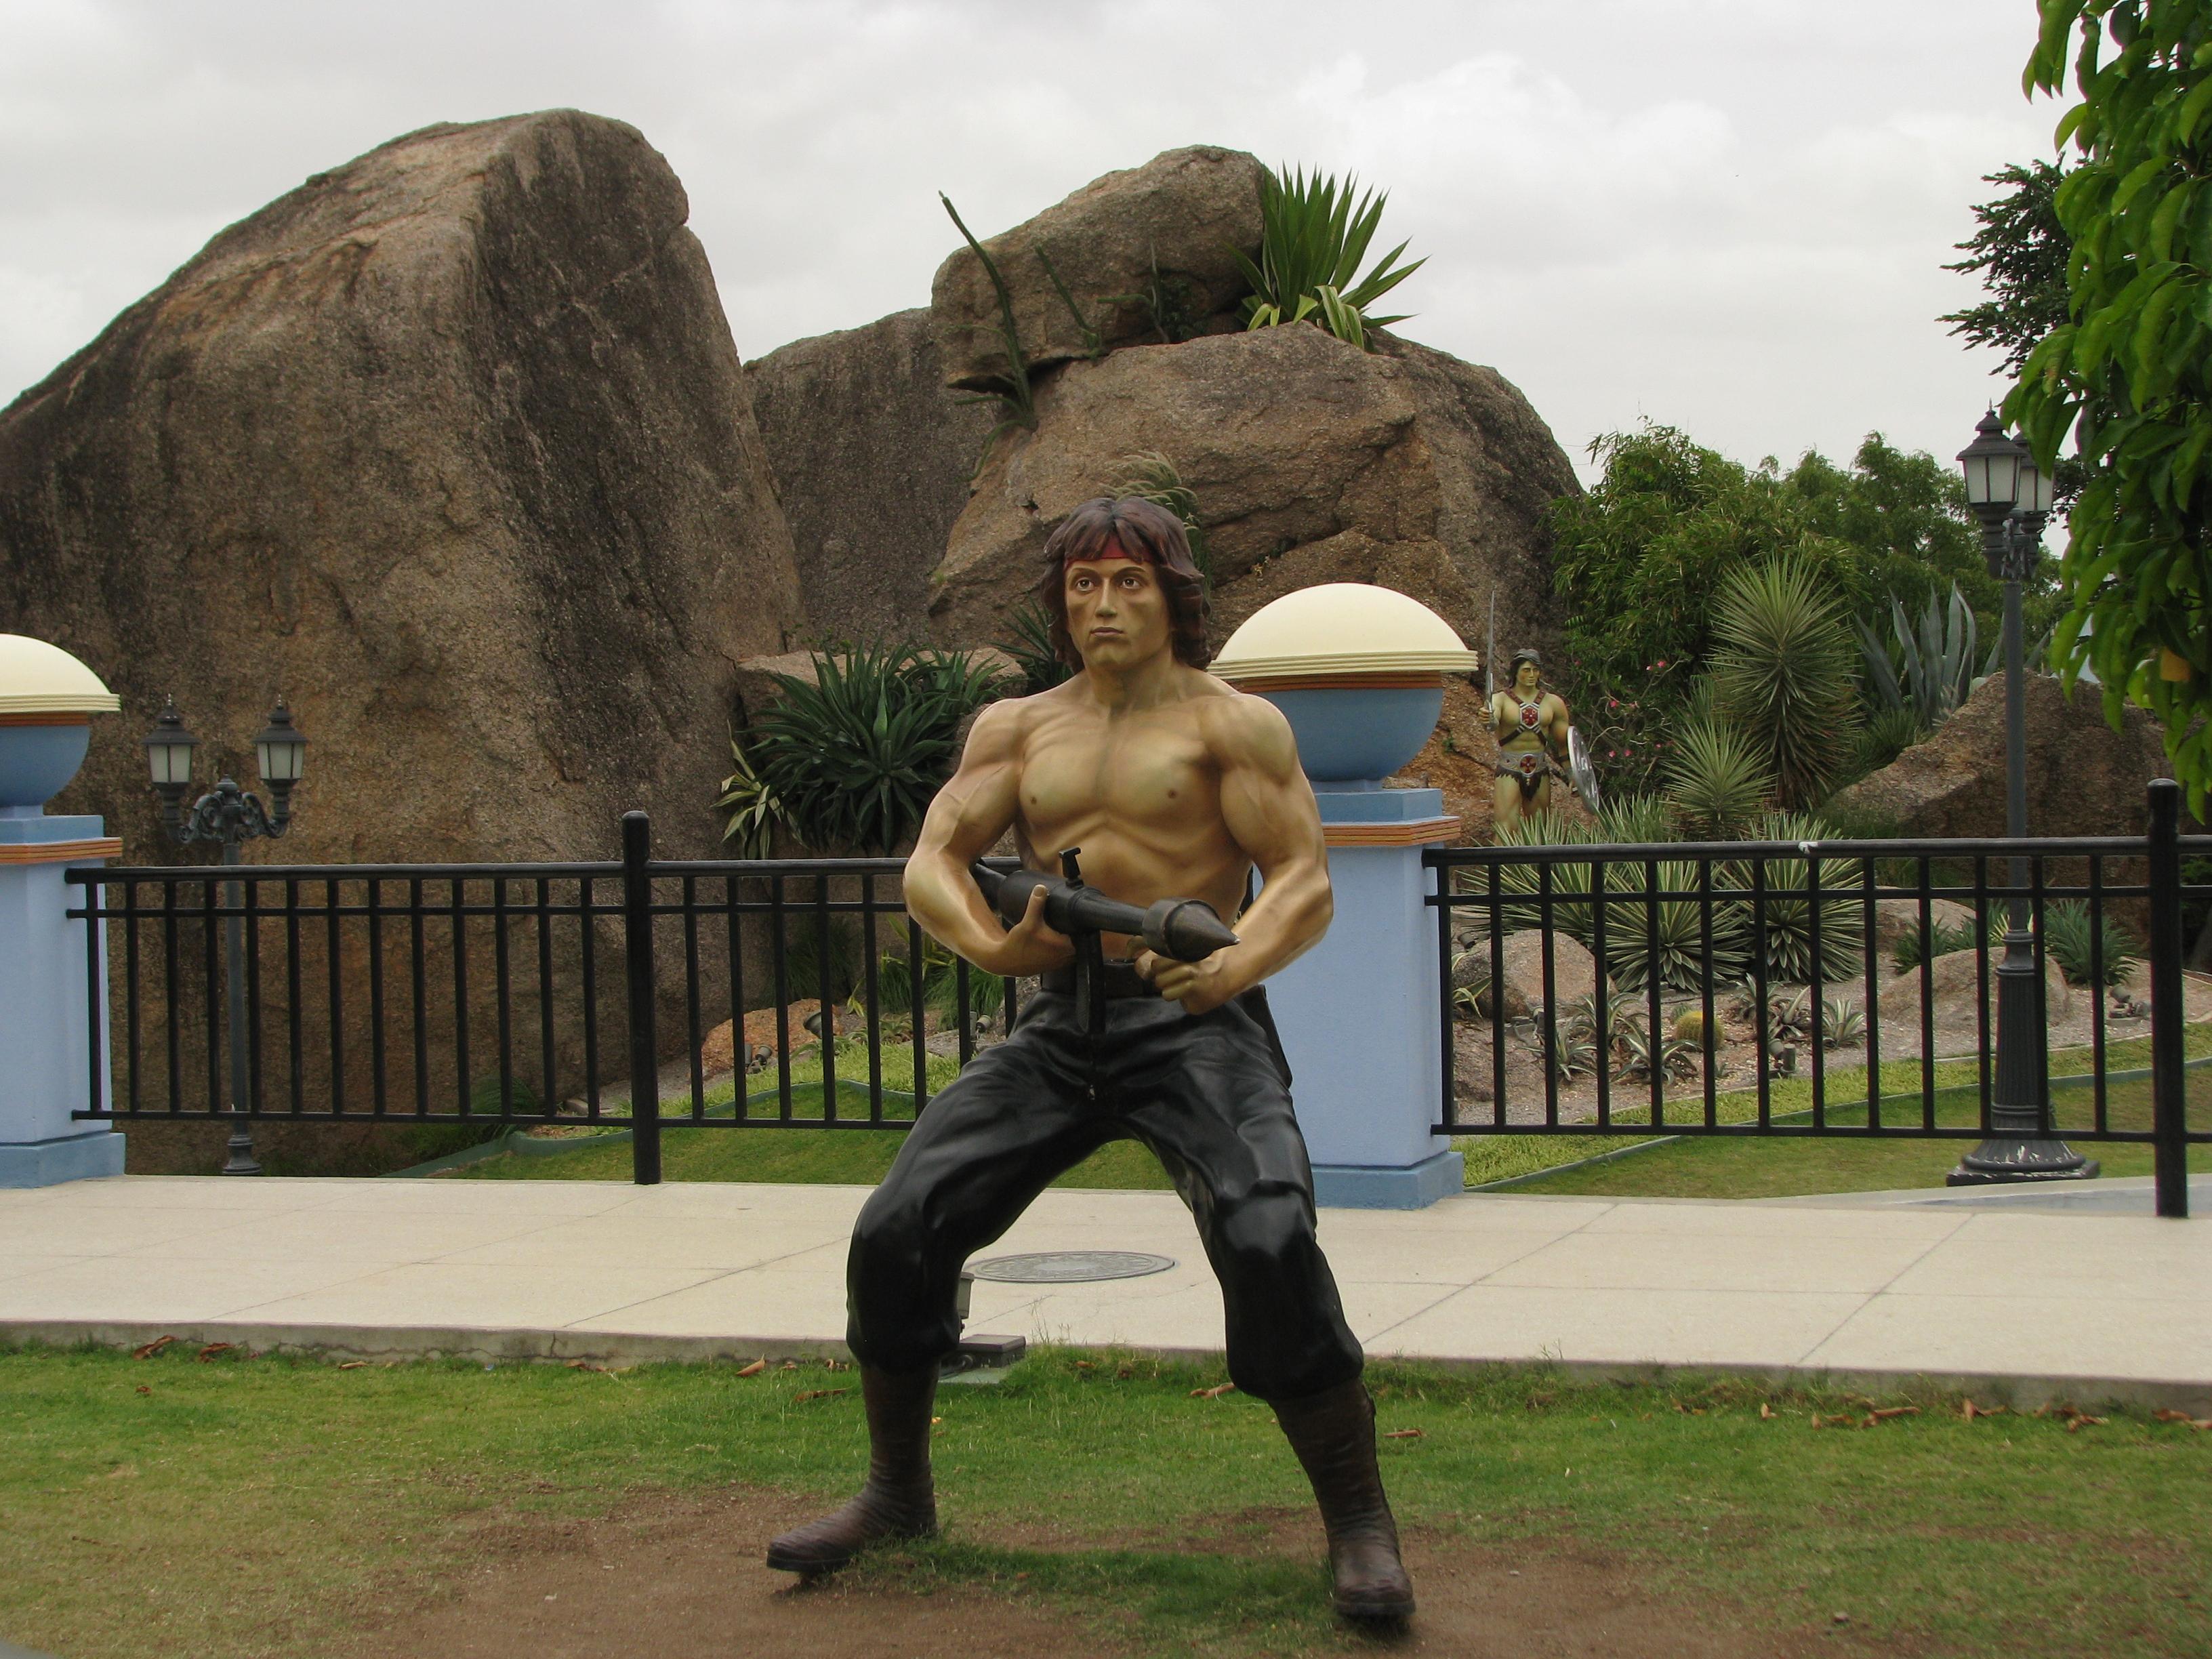 Statues in Ramoji FIlm City